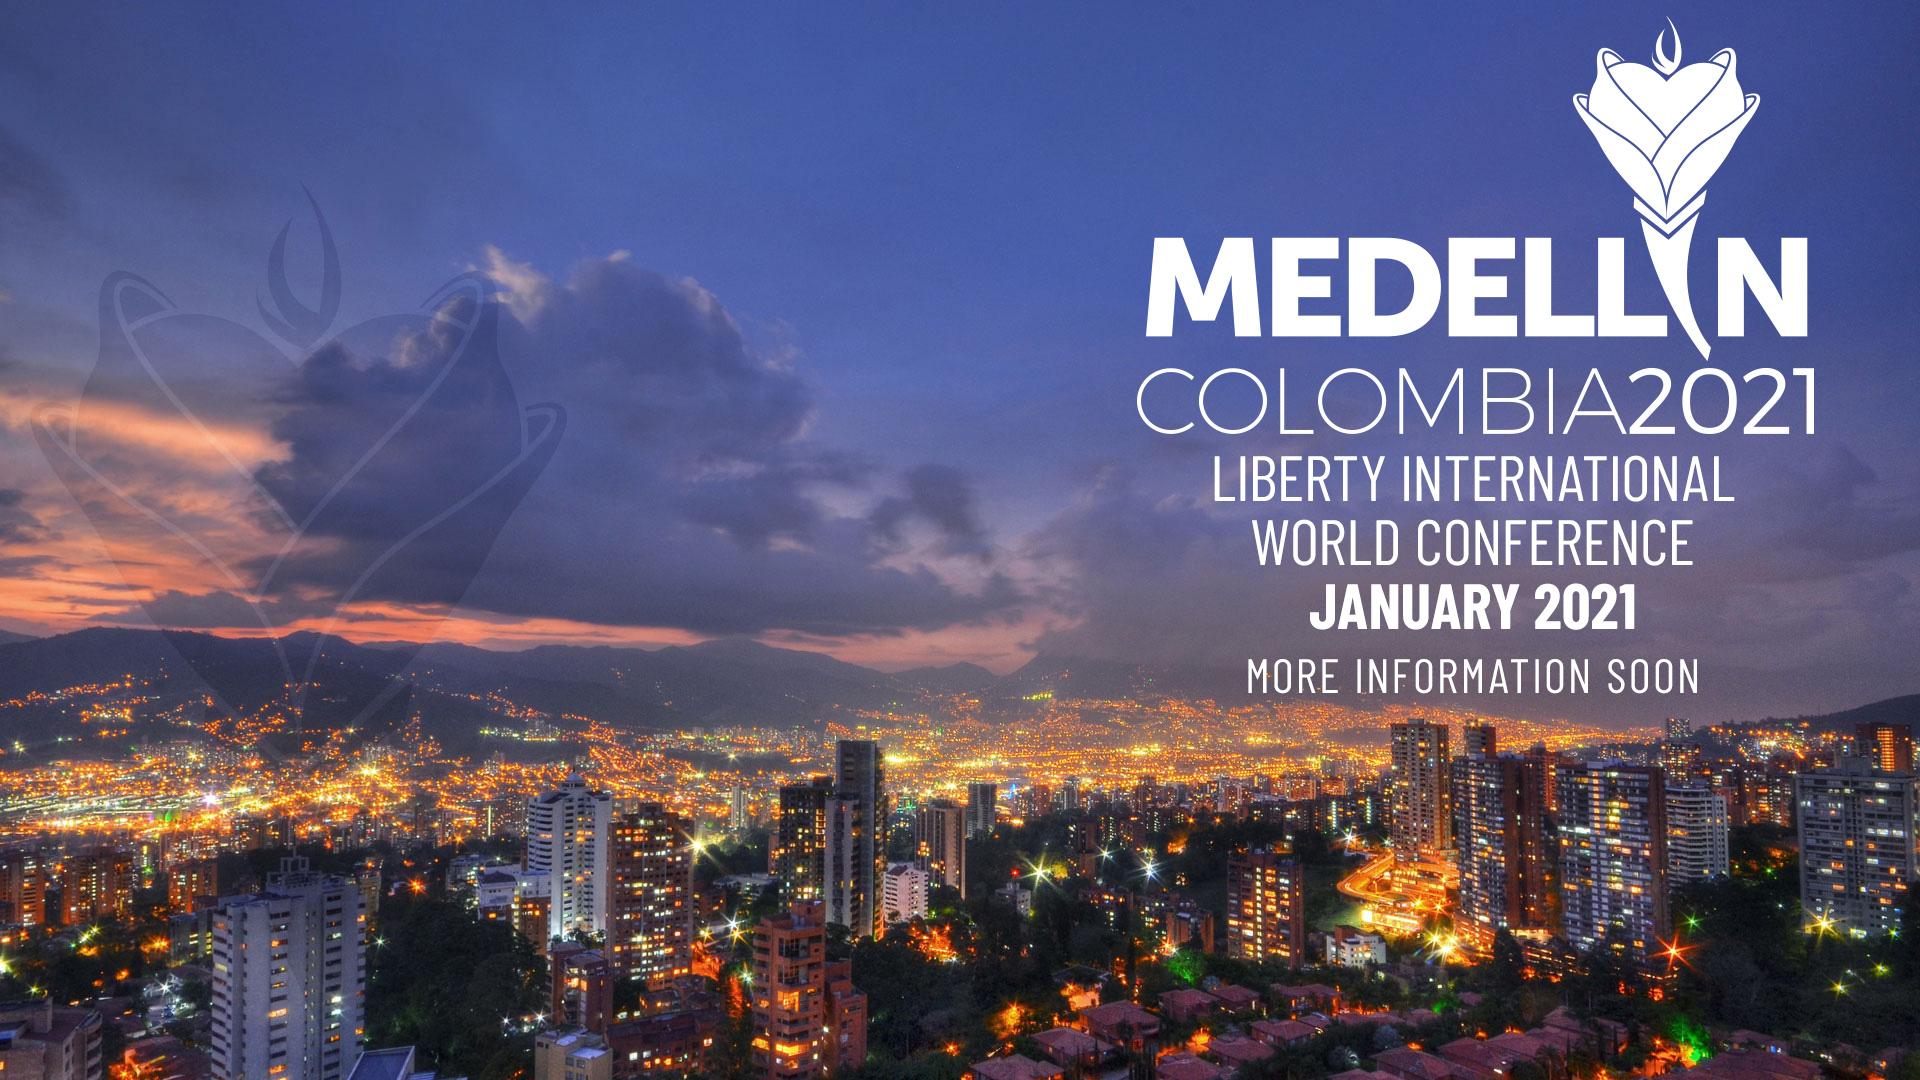 Liberty International World Conference – Rescheduled